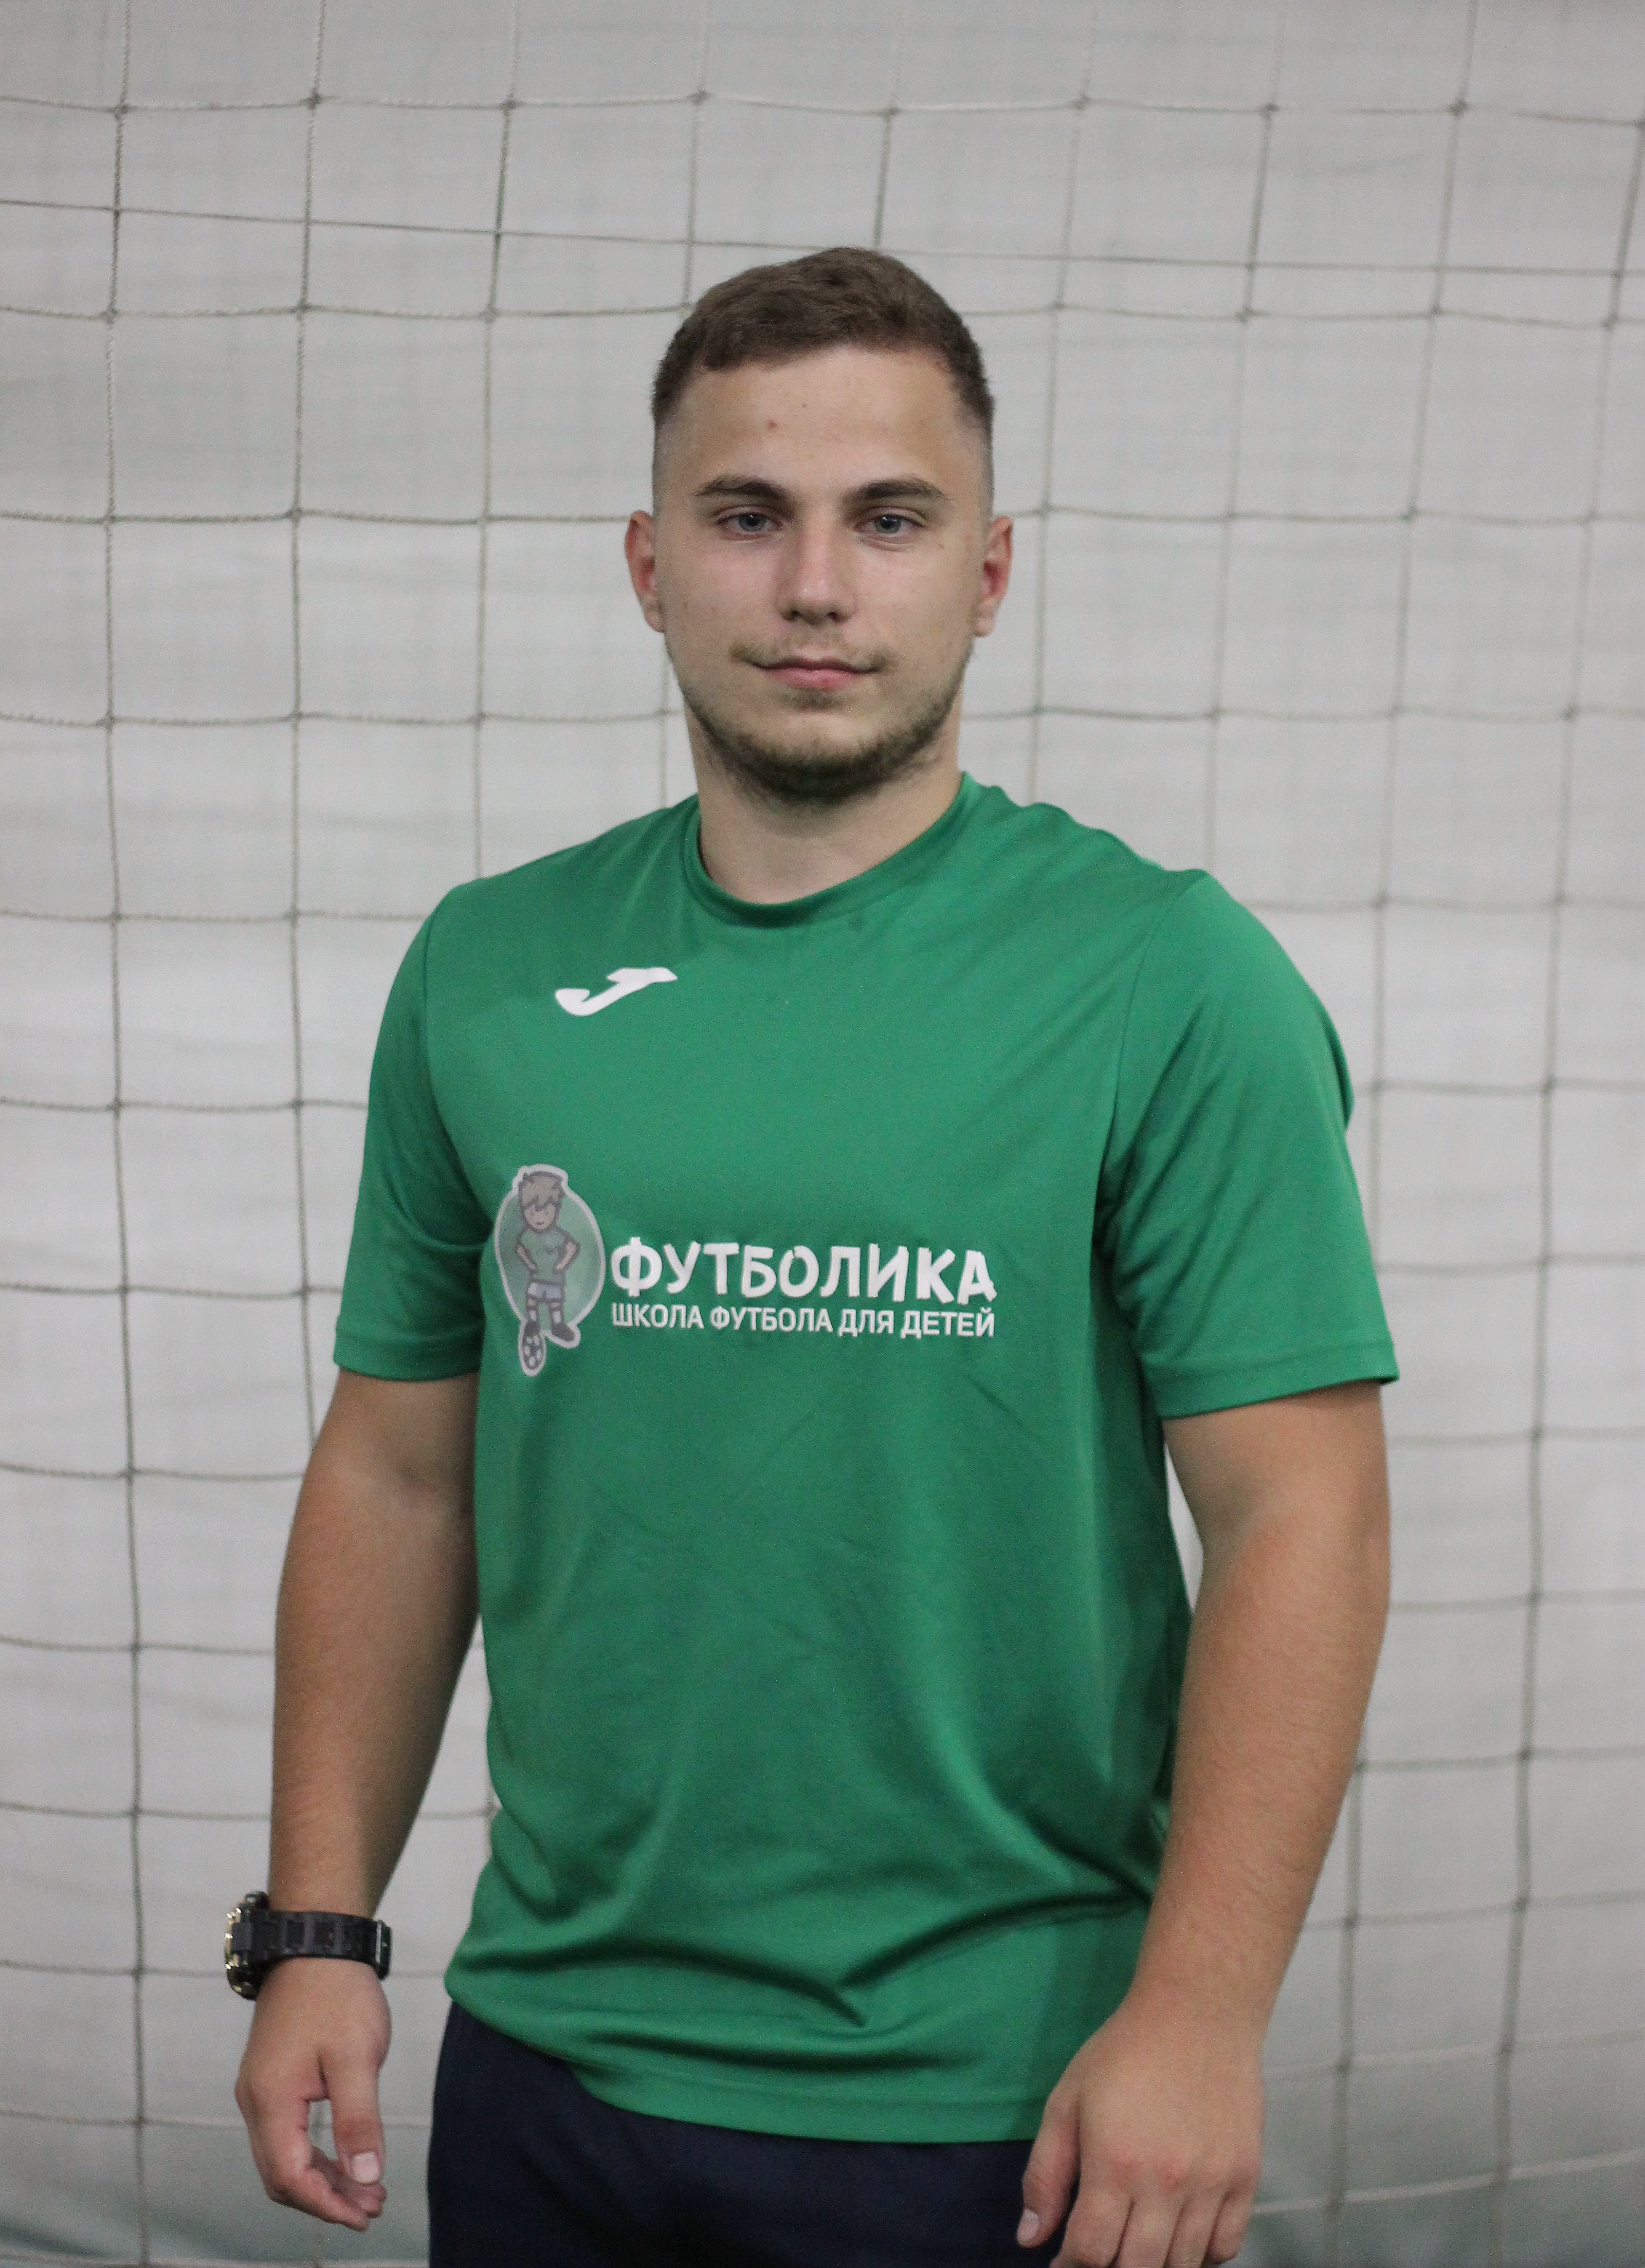 тренер футболики Ларионов Никита Алексеевич